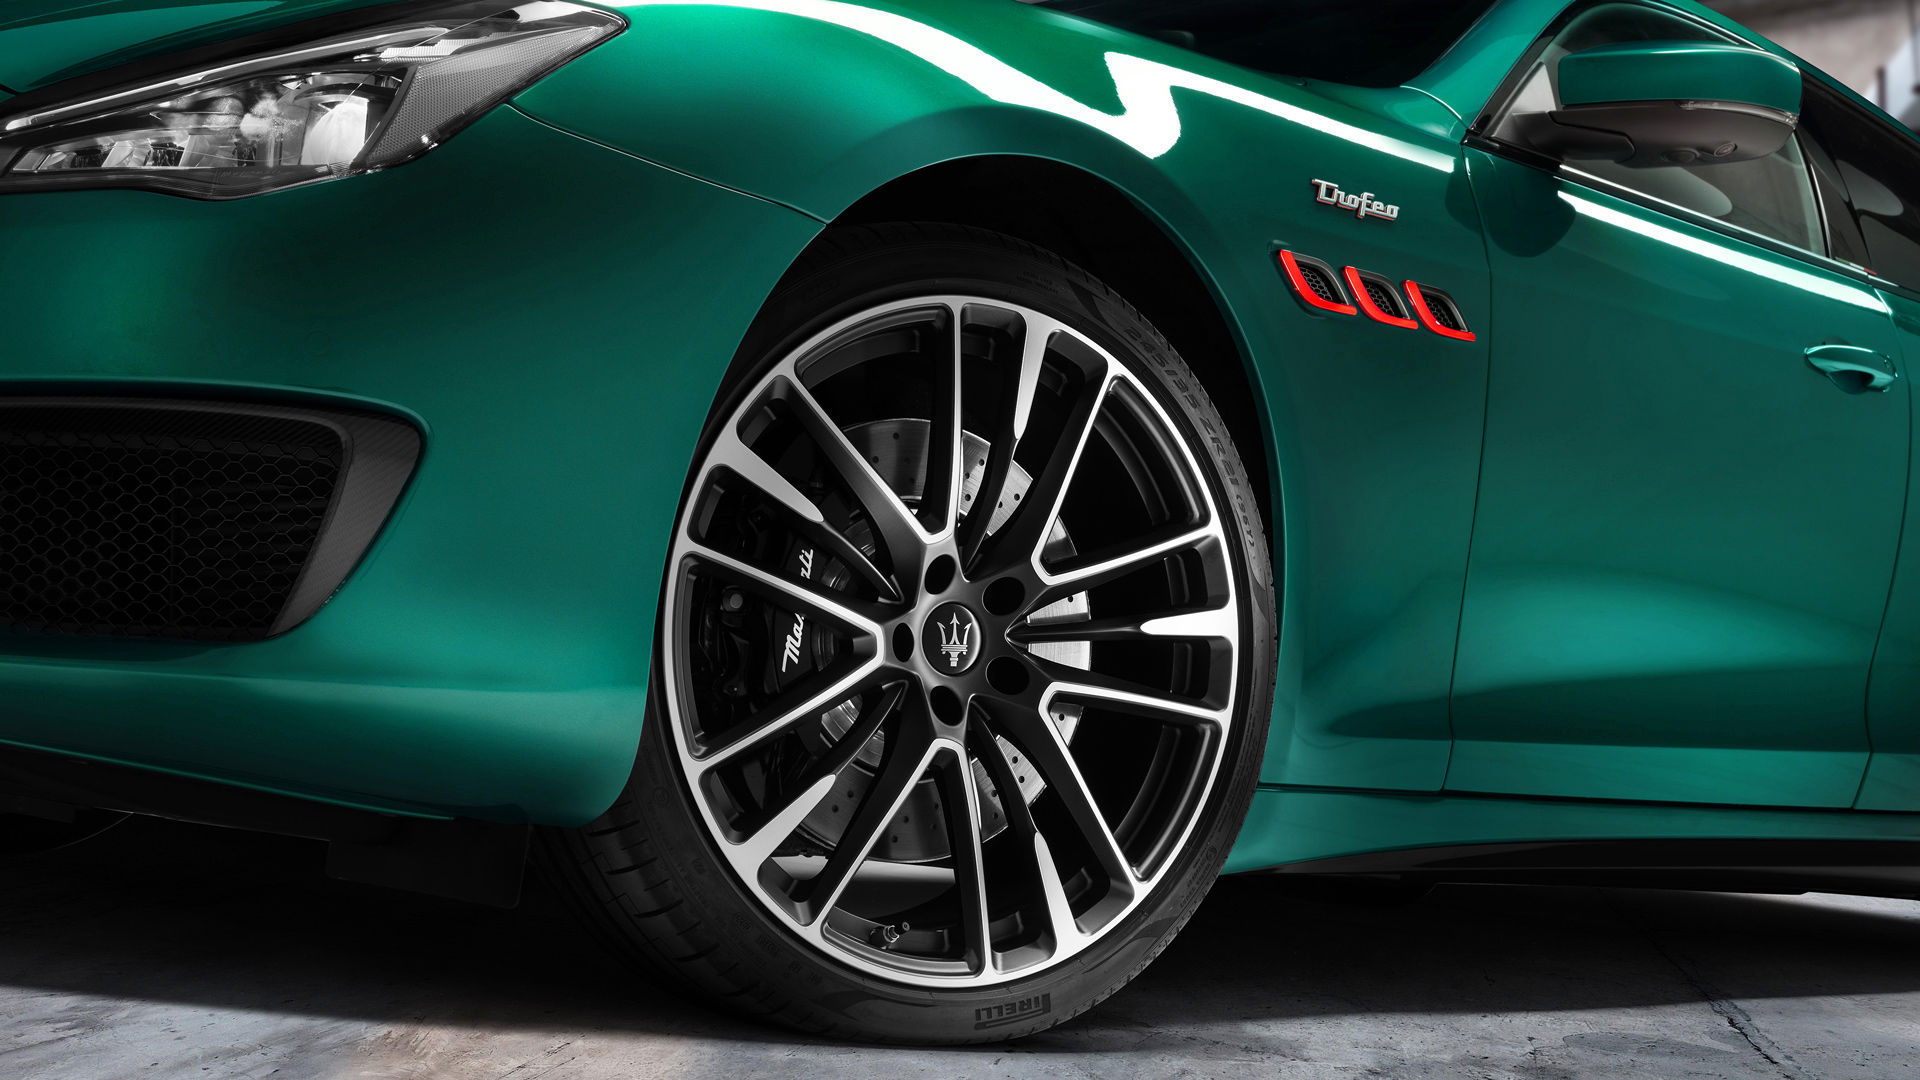 Maserati Quattroporte Trofeo - Grün - Felge